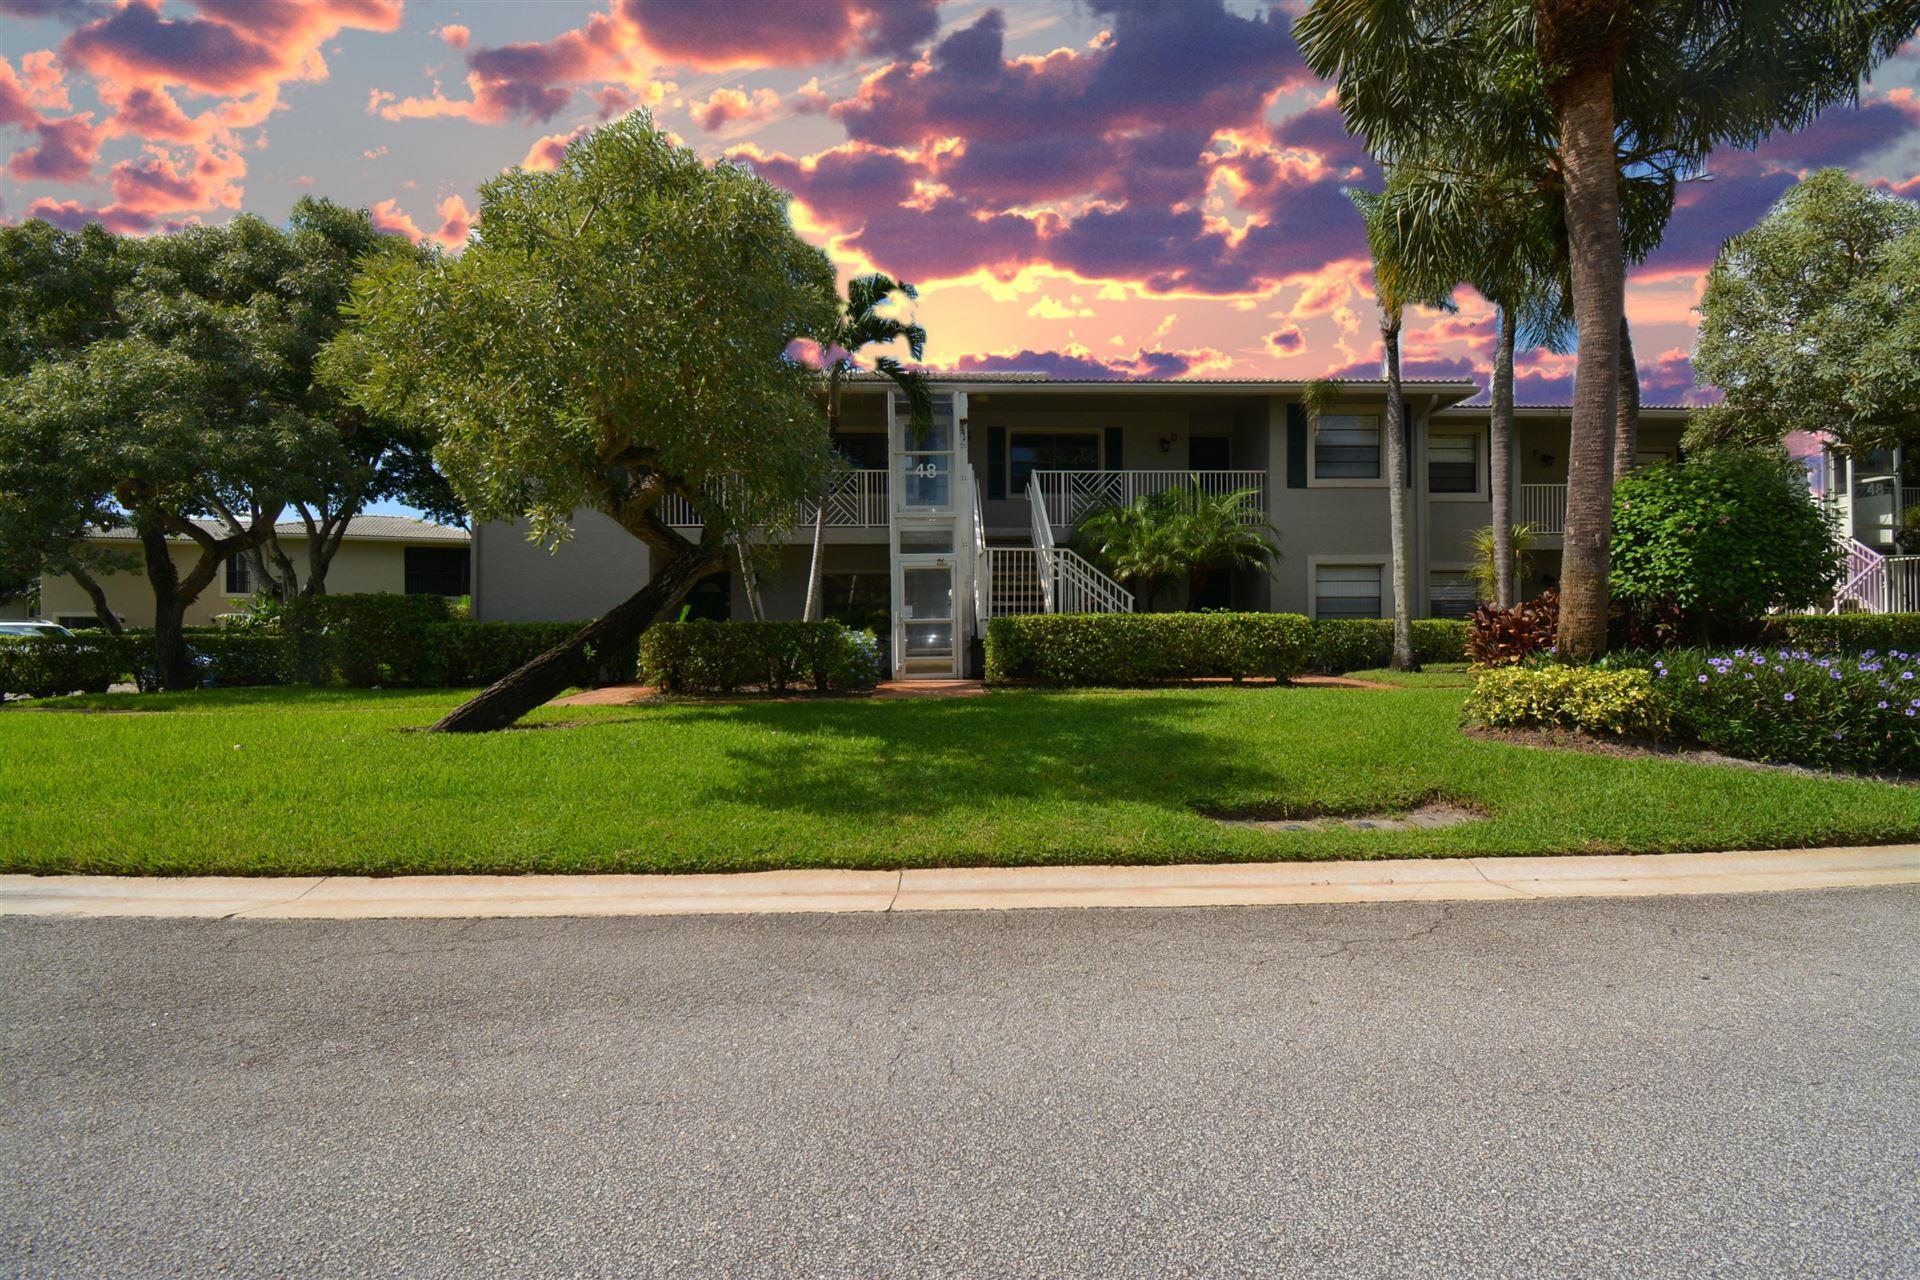 48 Stratford Lane #48b, Boynton Beach, FL 33436 - #: RX-10664880